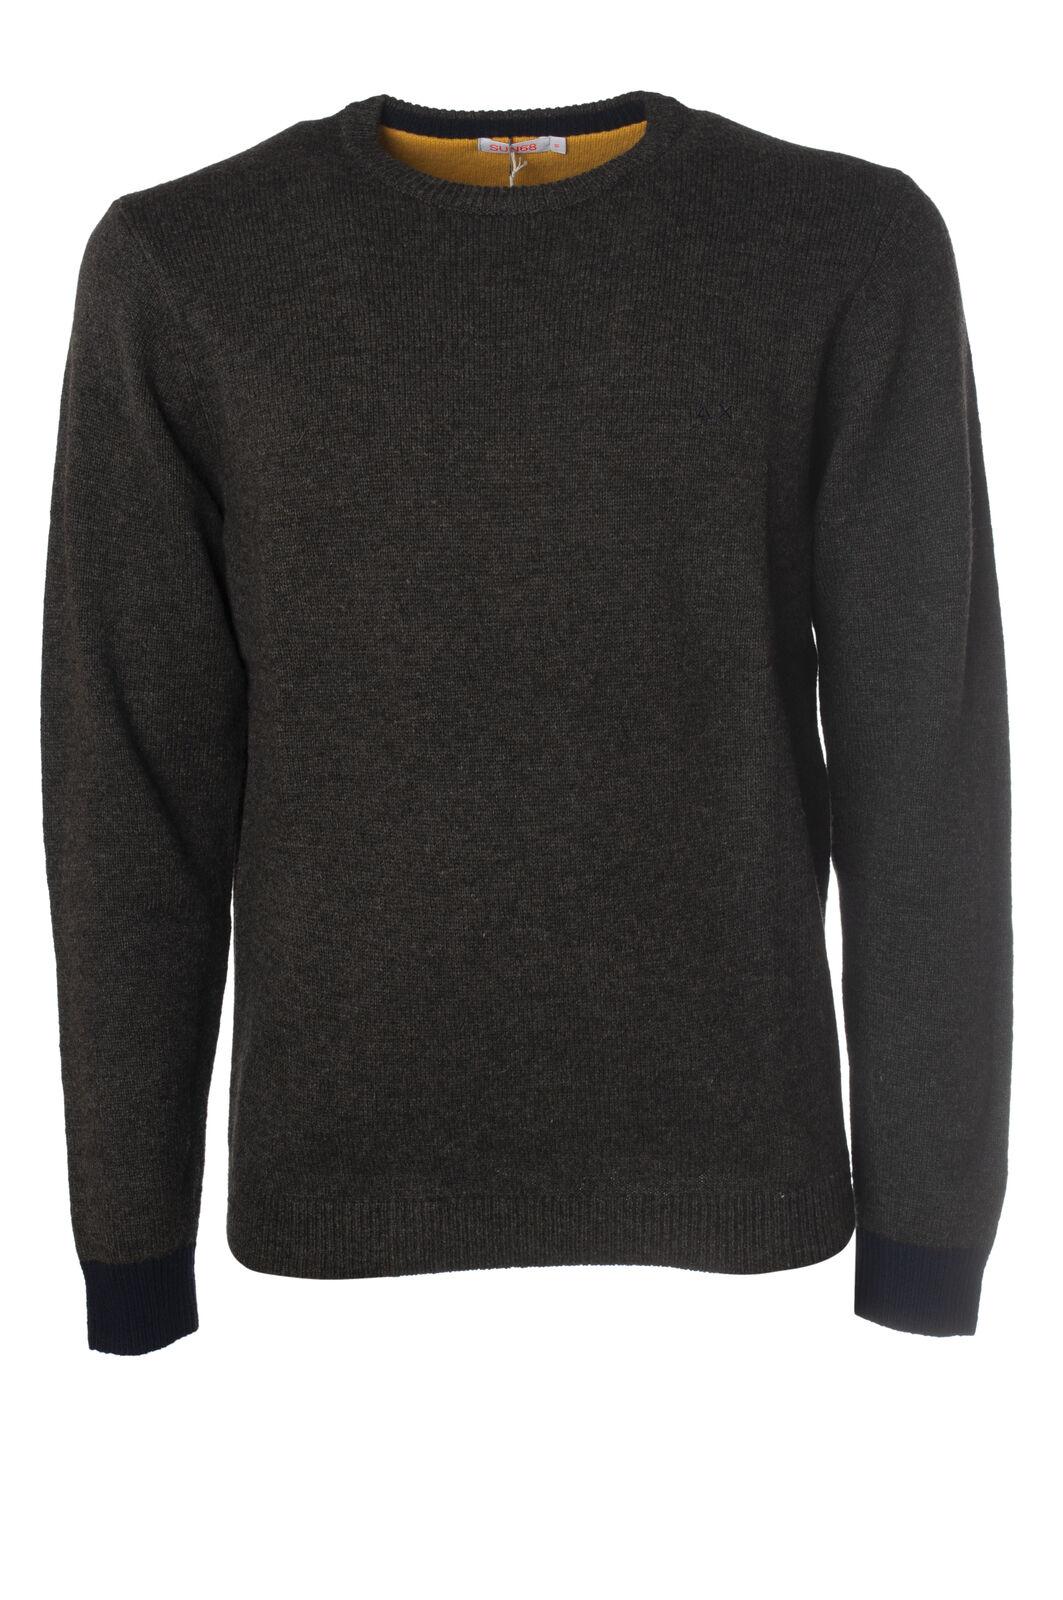 Sun 68 - Knitwear-Sweaters - Man - Grau - 5662909L181007